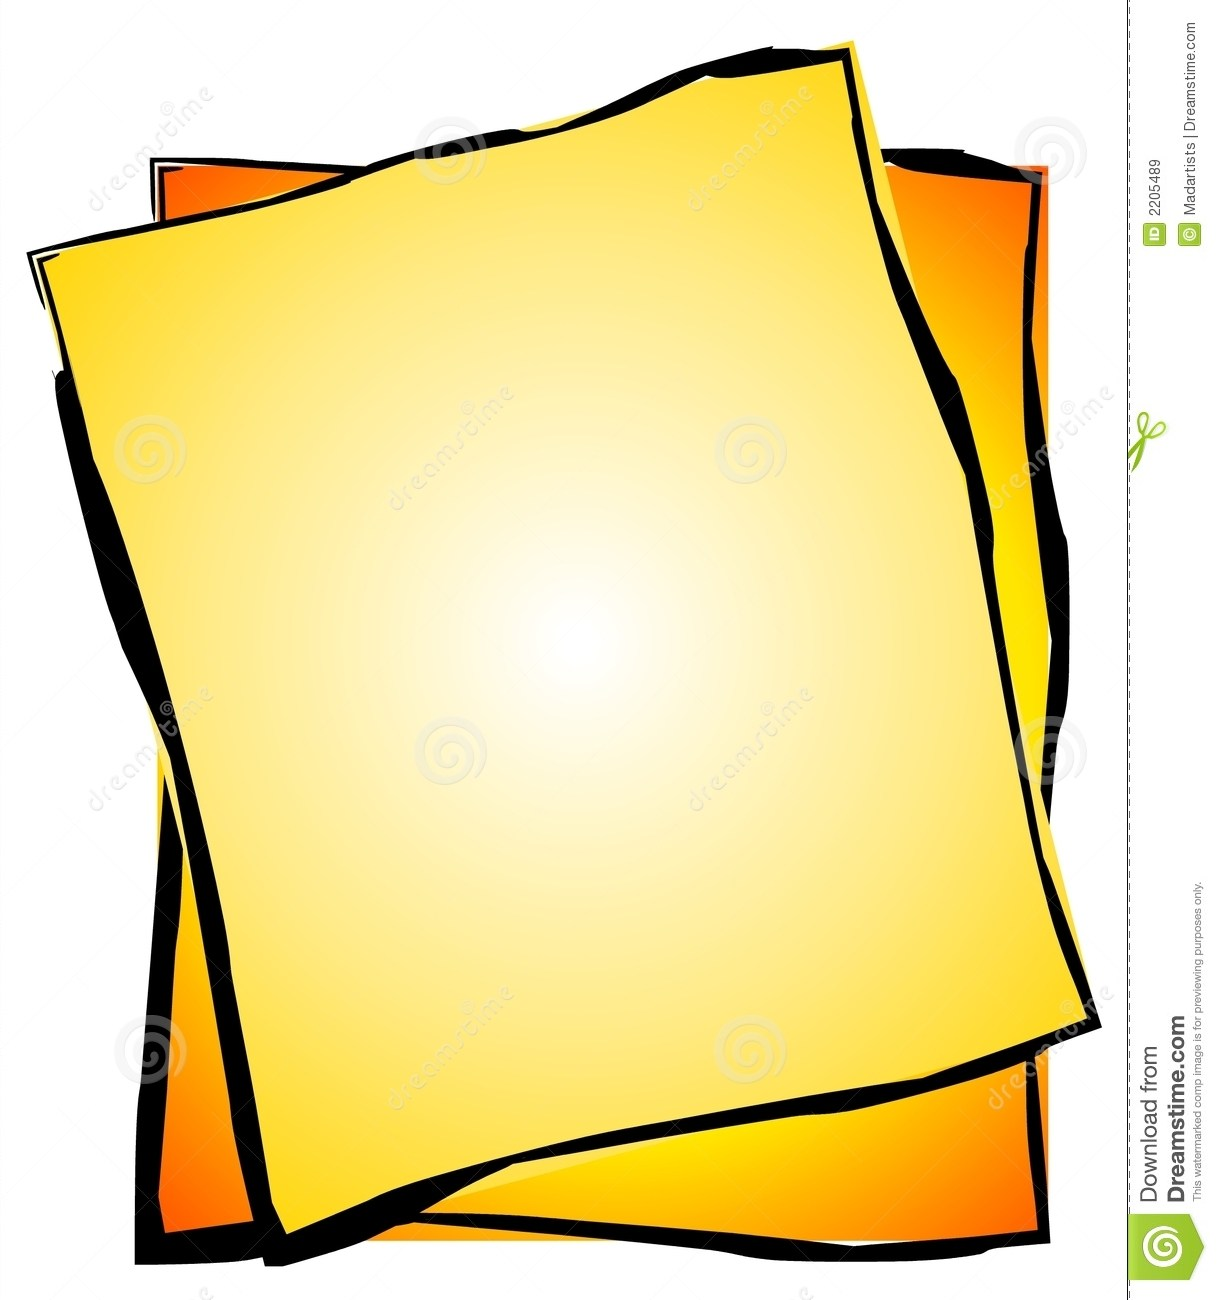 Piece of paper clipart 3 » Clipart Portal.